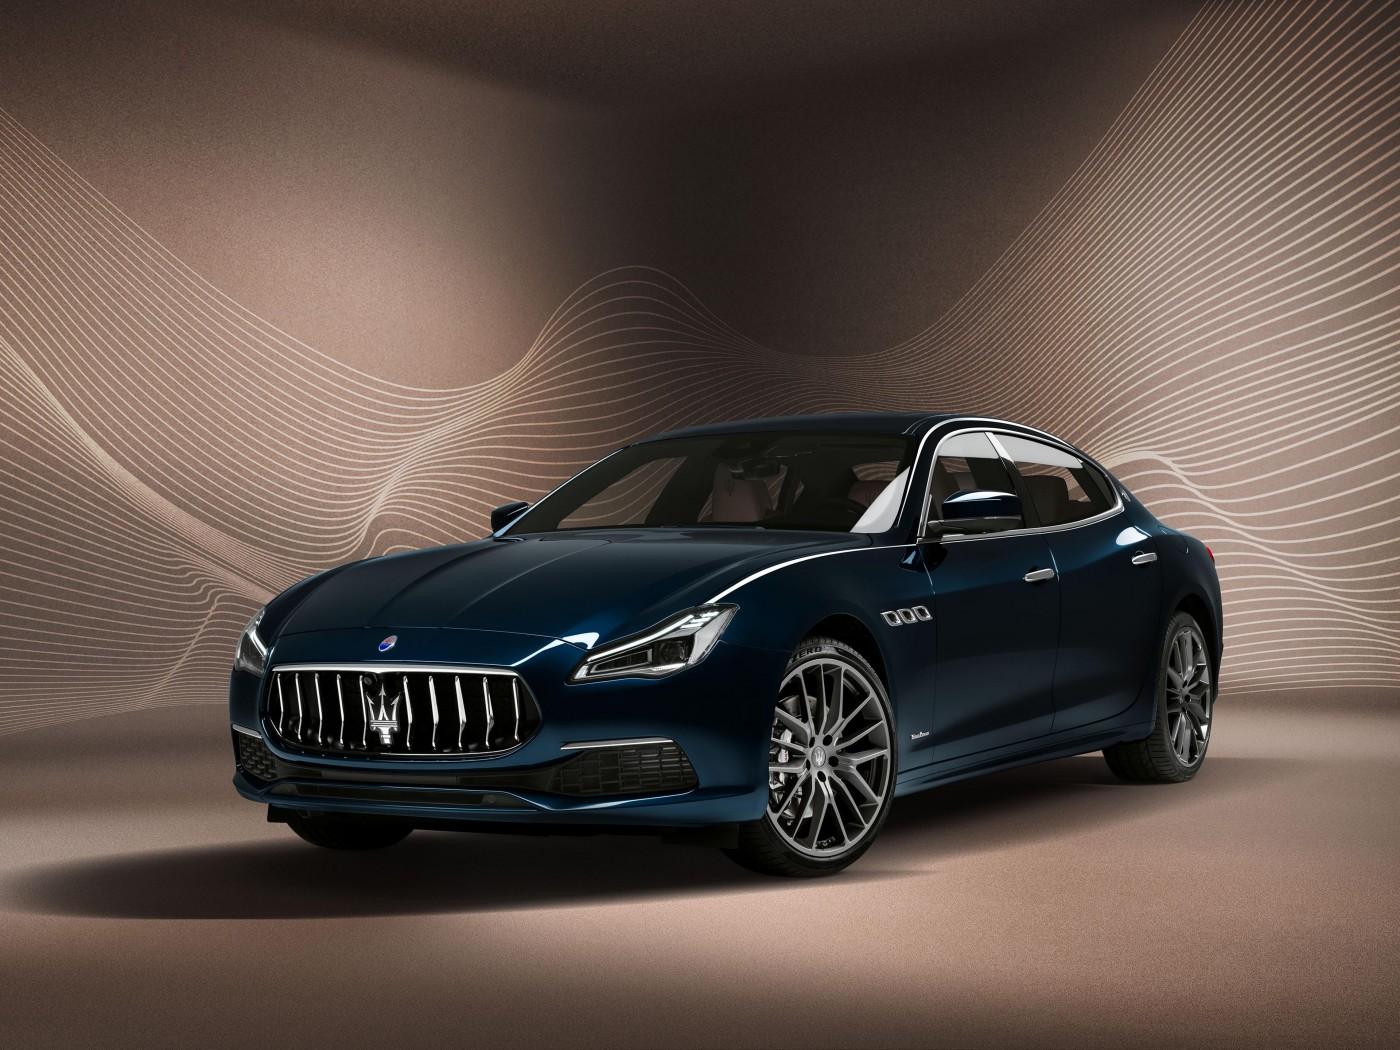 Maserati Quattroporte GranLusso Royale 2020 5K HD desktop 1400x1050